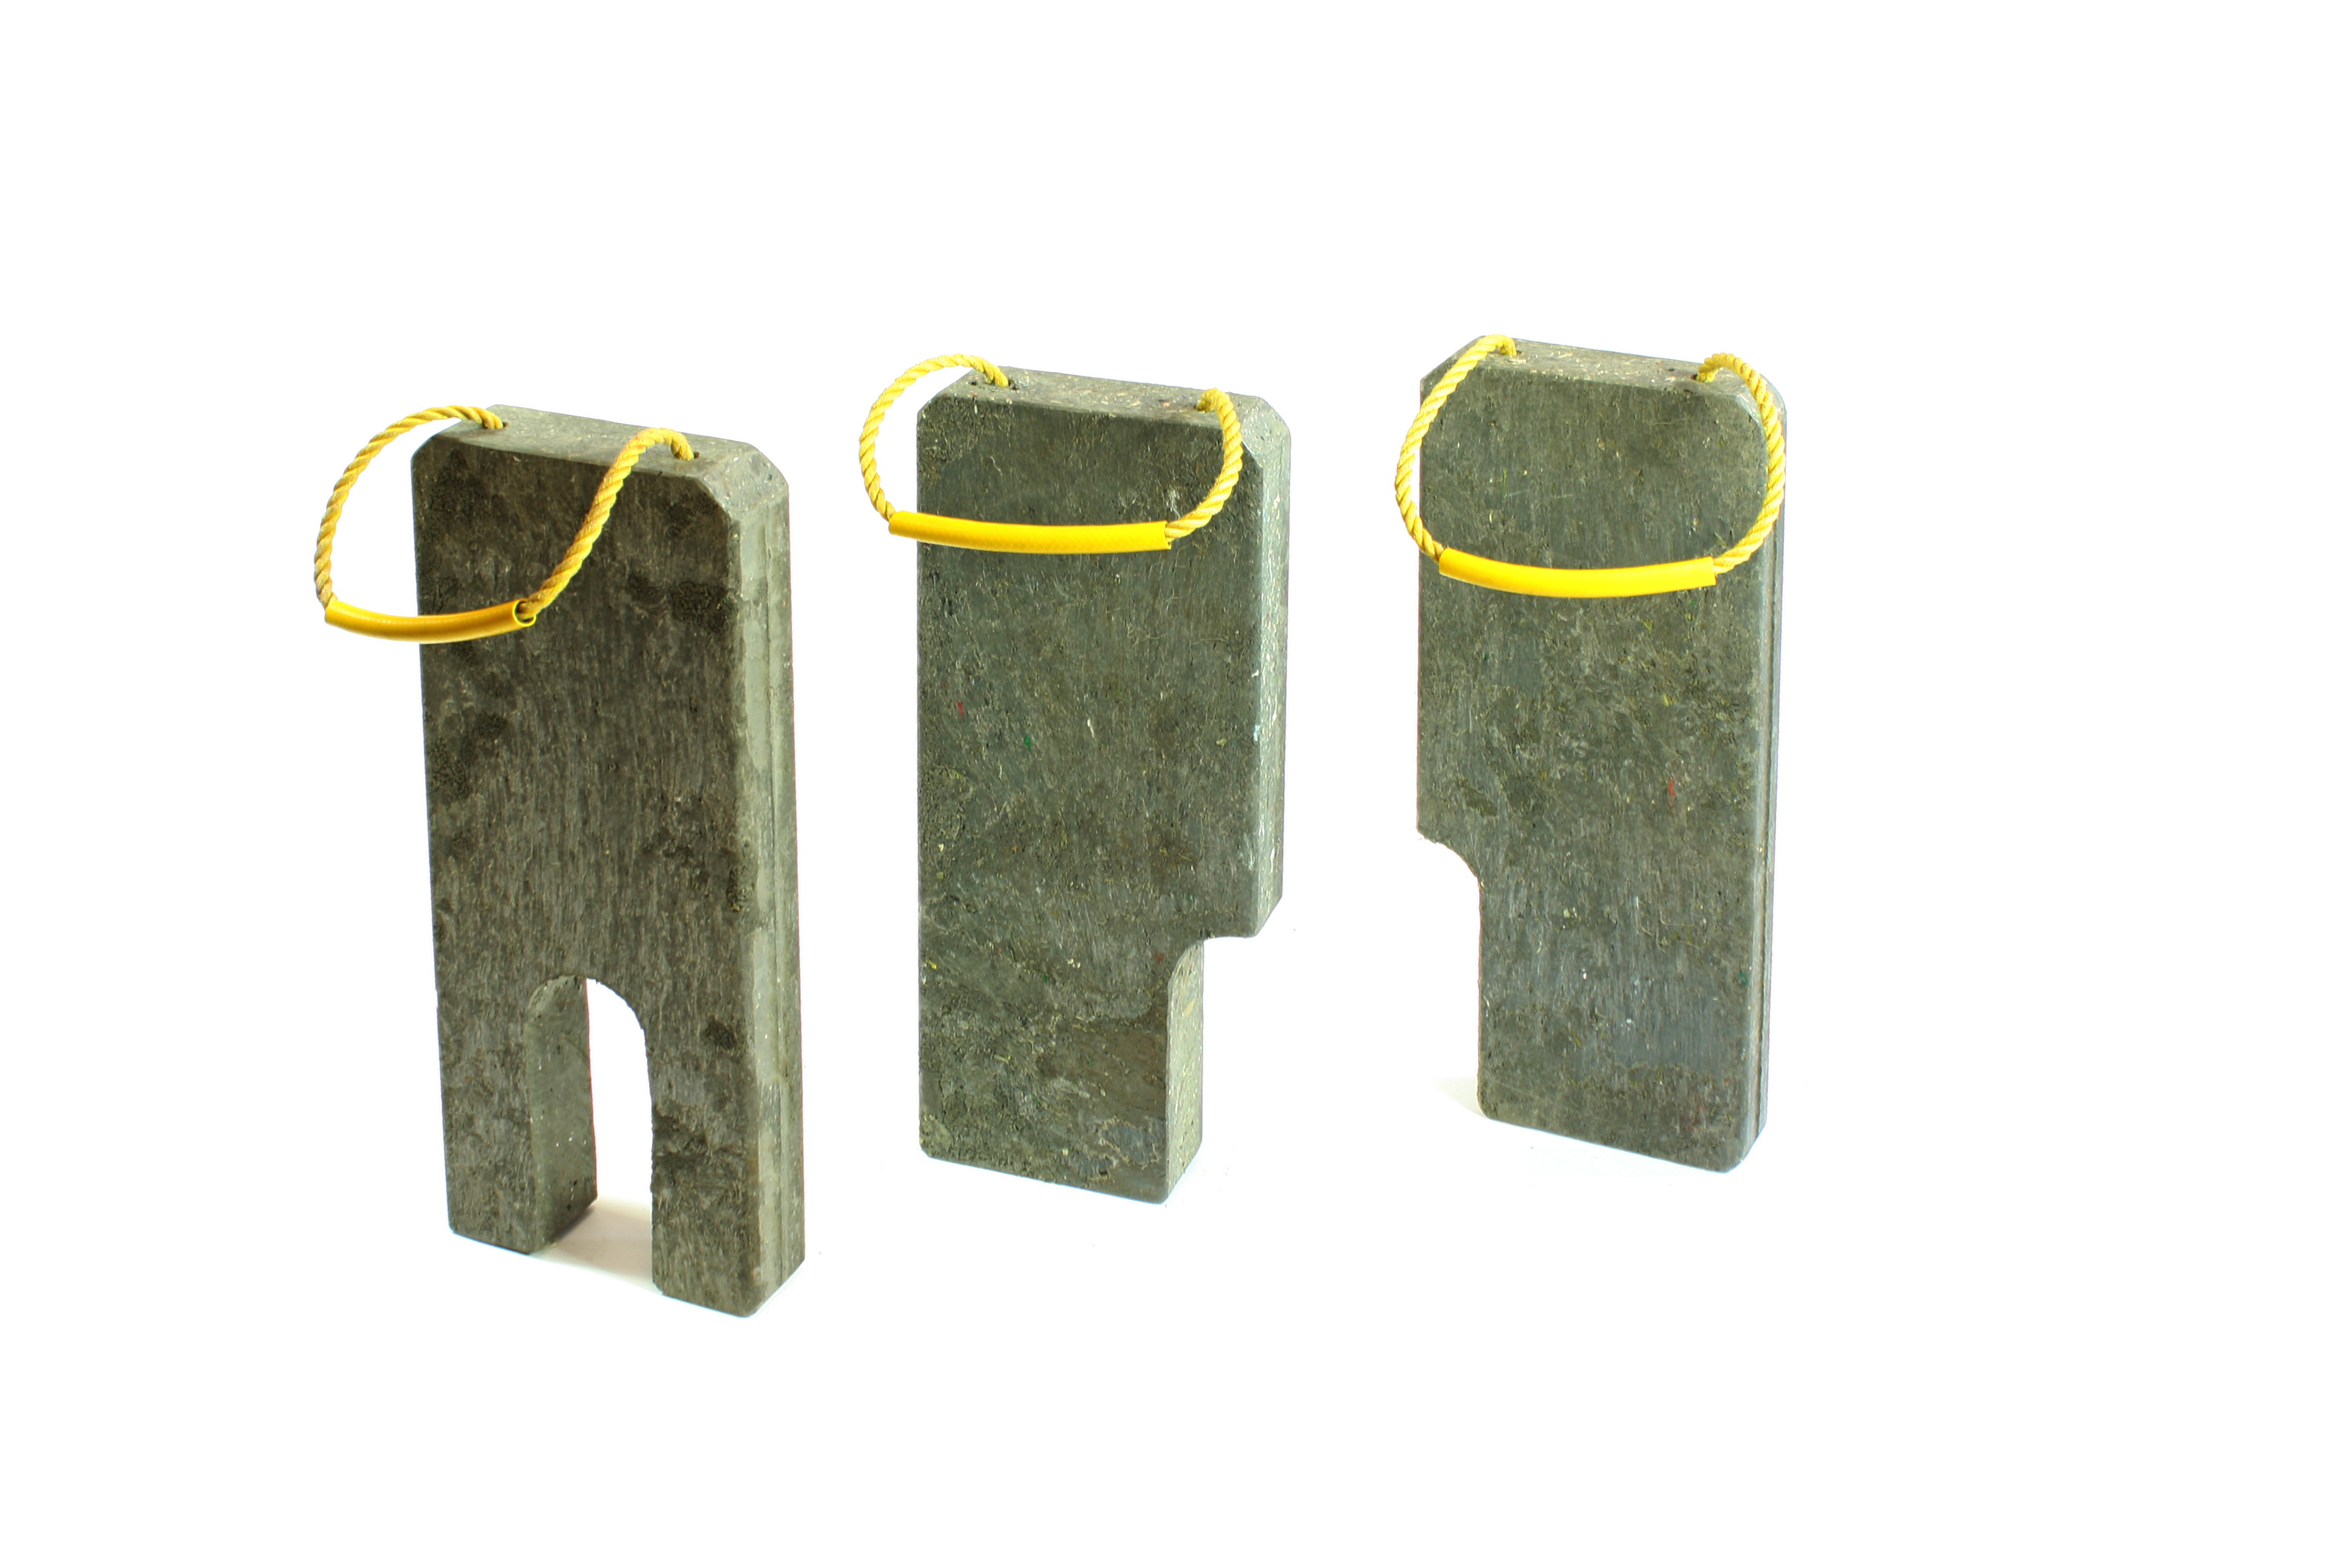 Support Boards (Set) Image